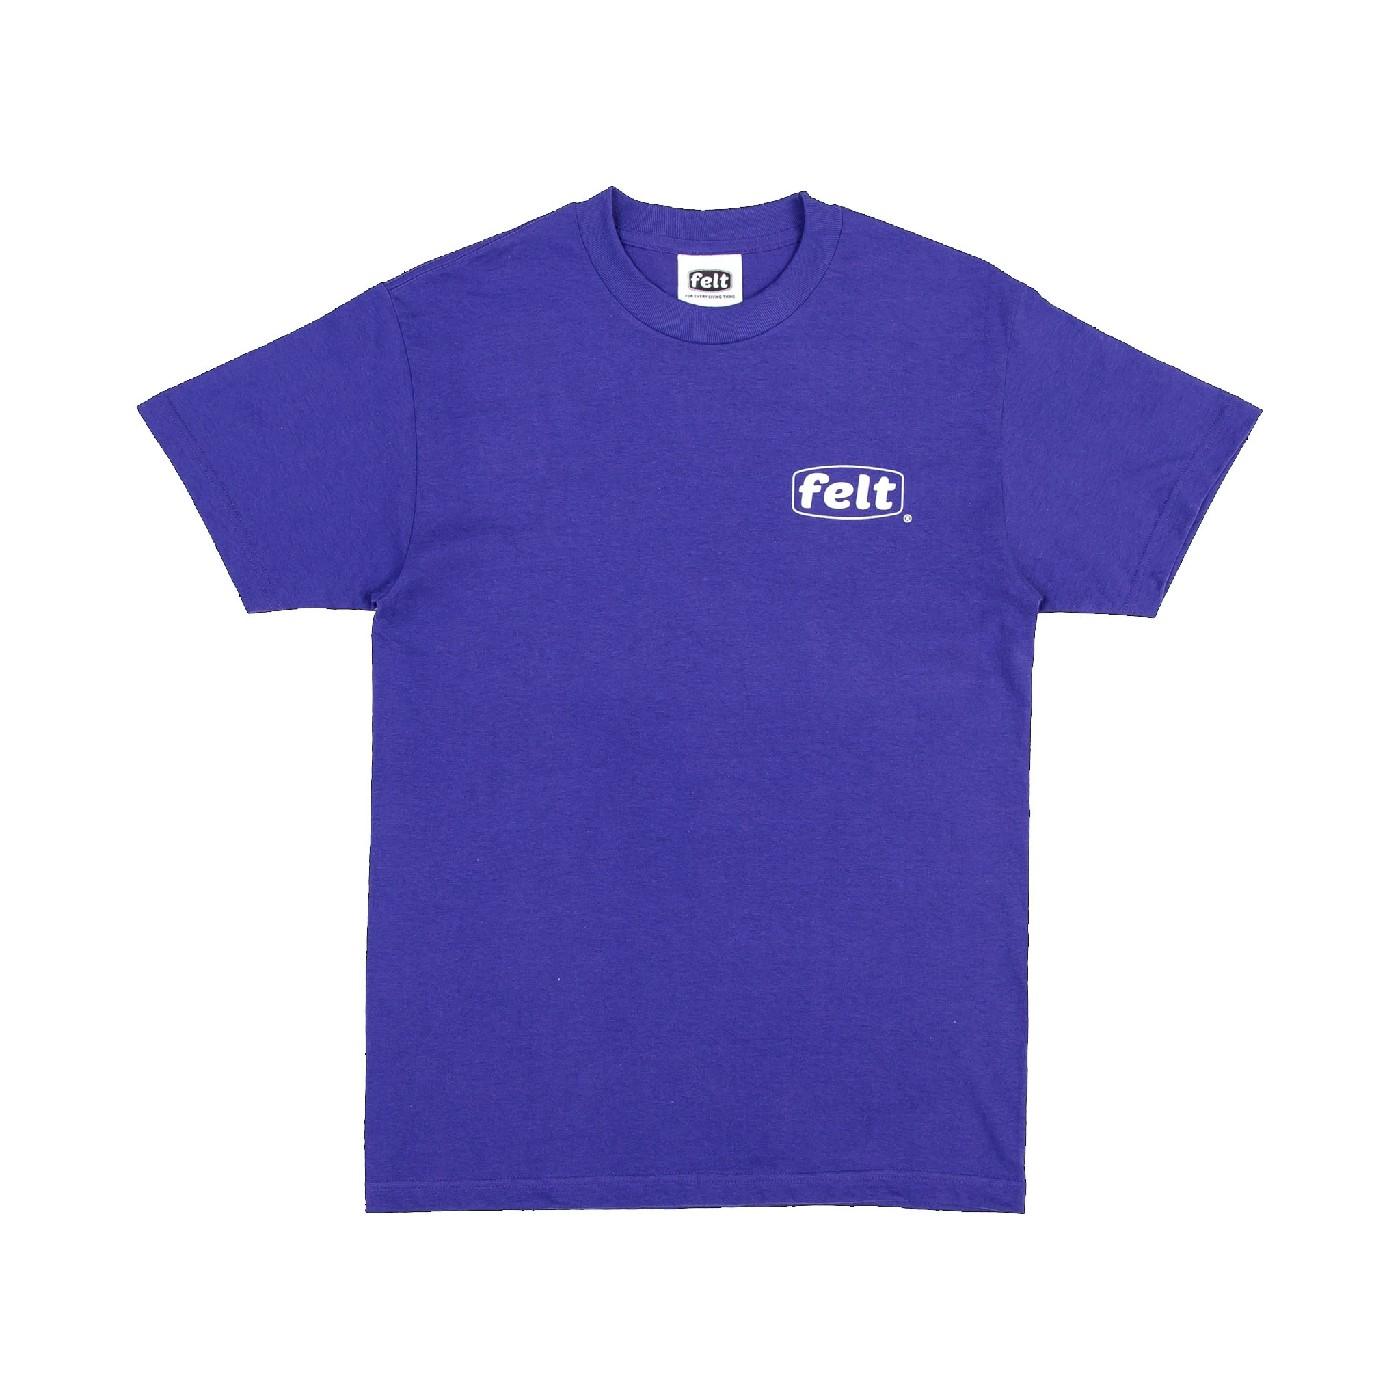 【FELT/フェルト】WORK LOGO T-SHIRT Tシャツ / PPL